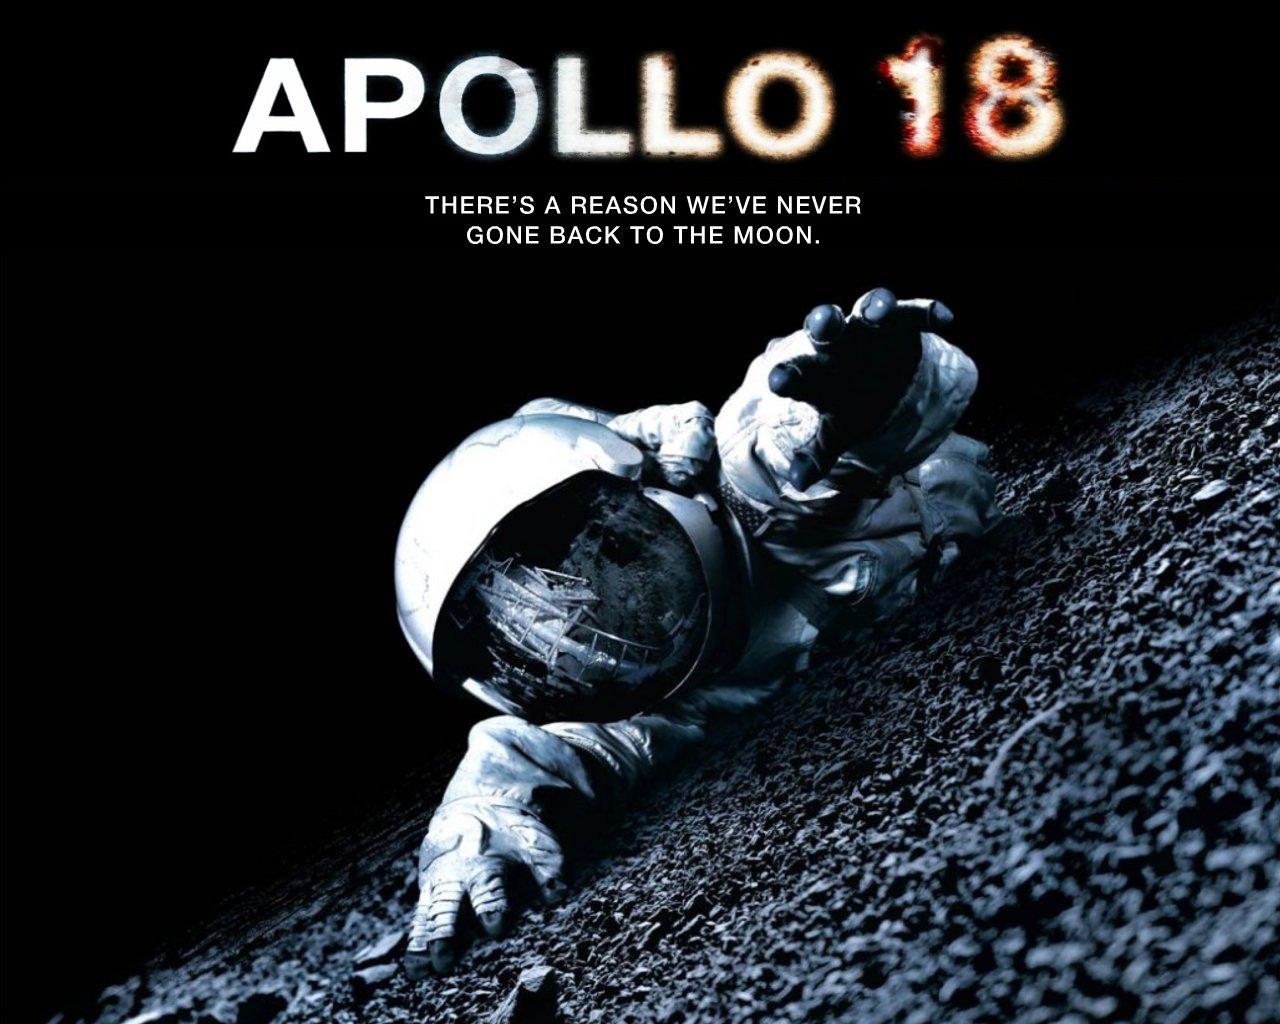 http://3.bp.blogspot.com/-_BLBhapXwFo/TsHeAfkgqHI/AAAAAAAAARE/aXDCvBqjsyU/s1600/Apollo-18-Wallpaper-04.jpg